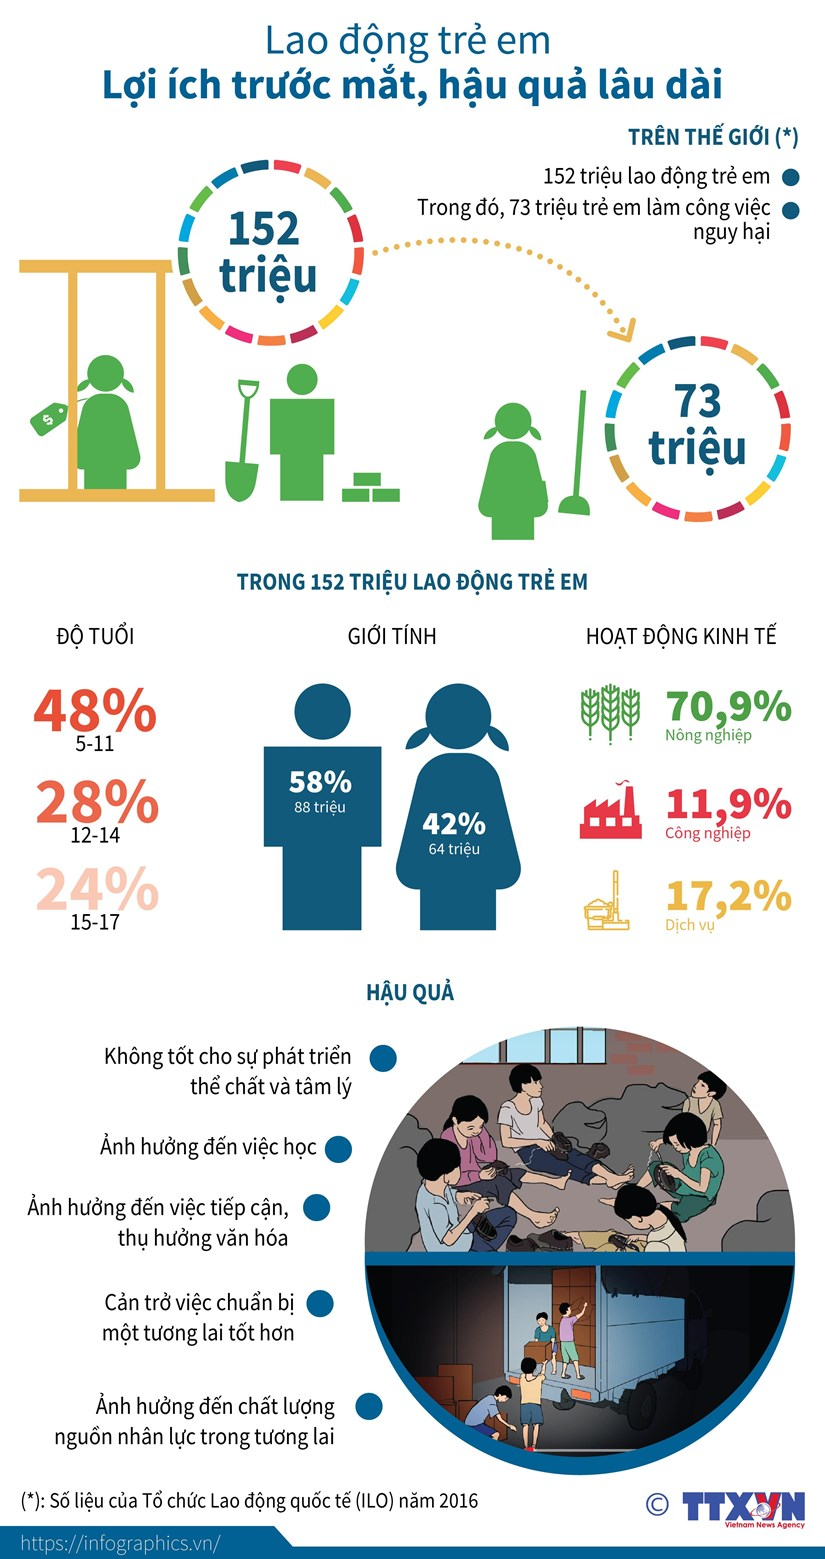 [Infographics] Lao dong tre em: Loi ich truoc mat, hau qua lau dai hinh anh 1